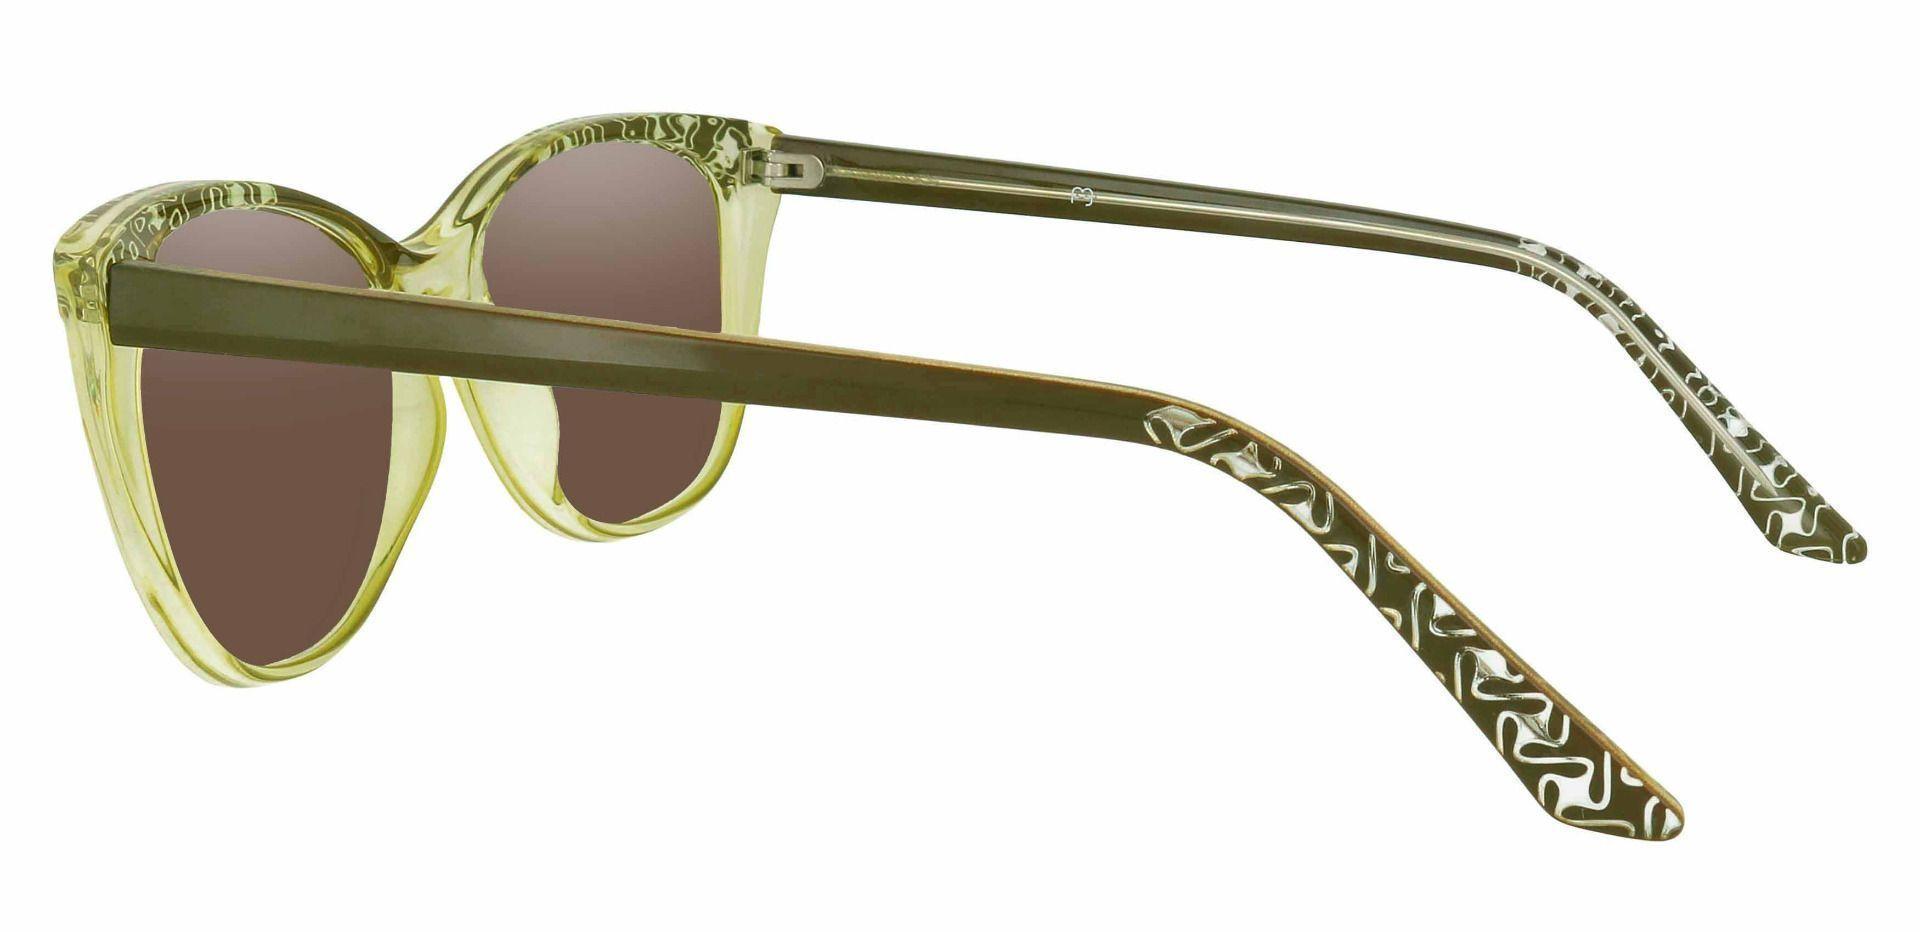 Alberta Cat Eye Progressive Sunglasses - Green Frame With Brown Lenses